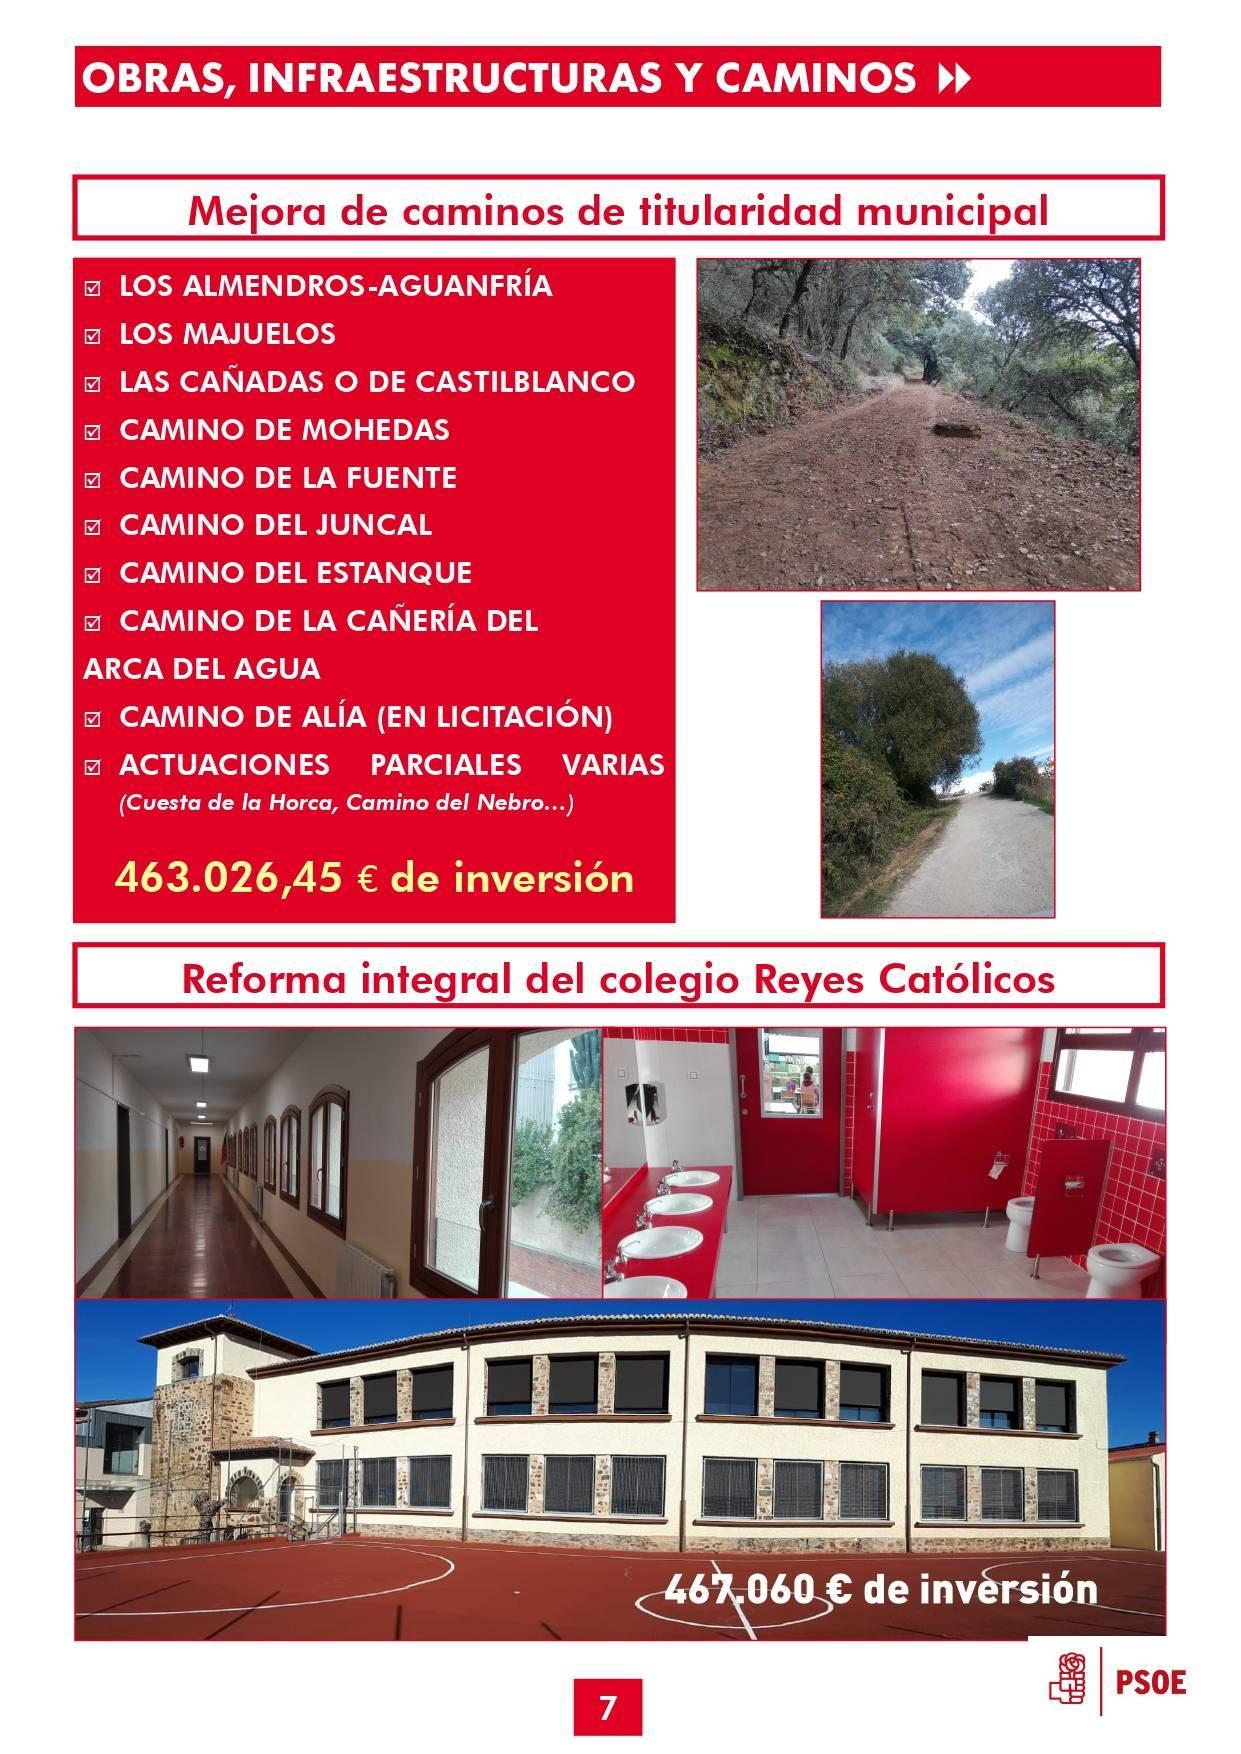 Boletín informativo de gestión municipal 2015-2019 - Guadalupe (Cáceres) 7